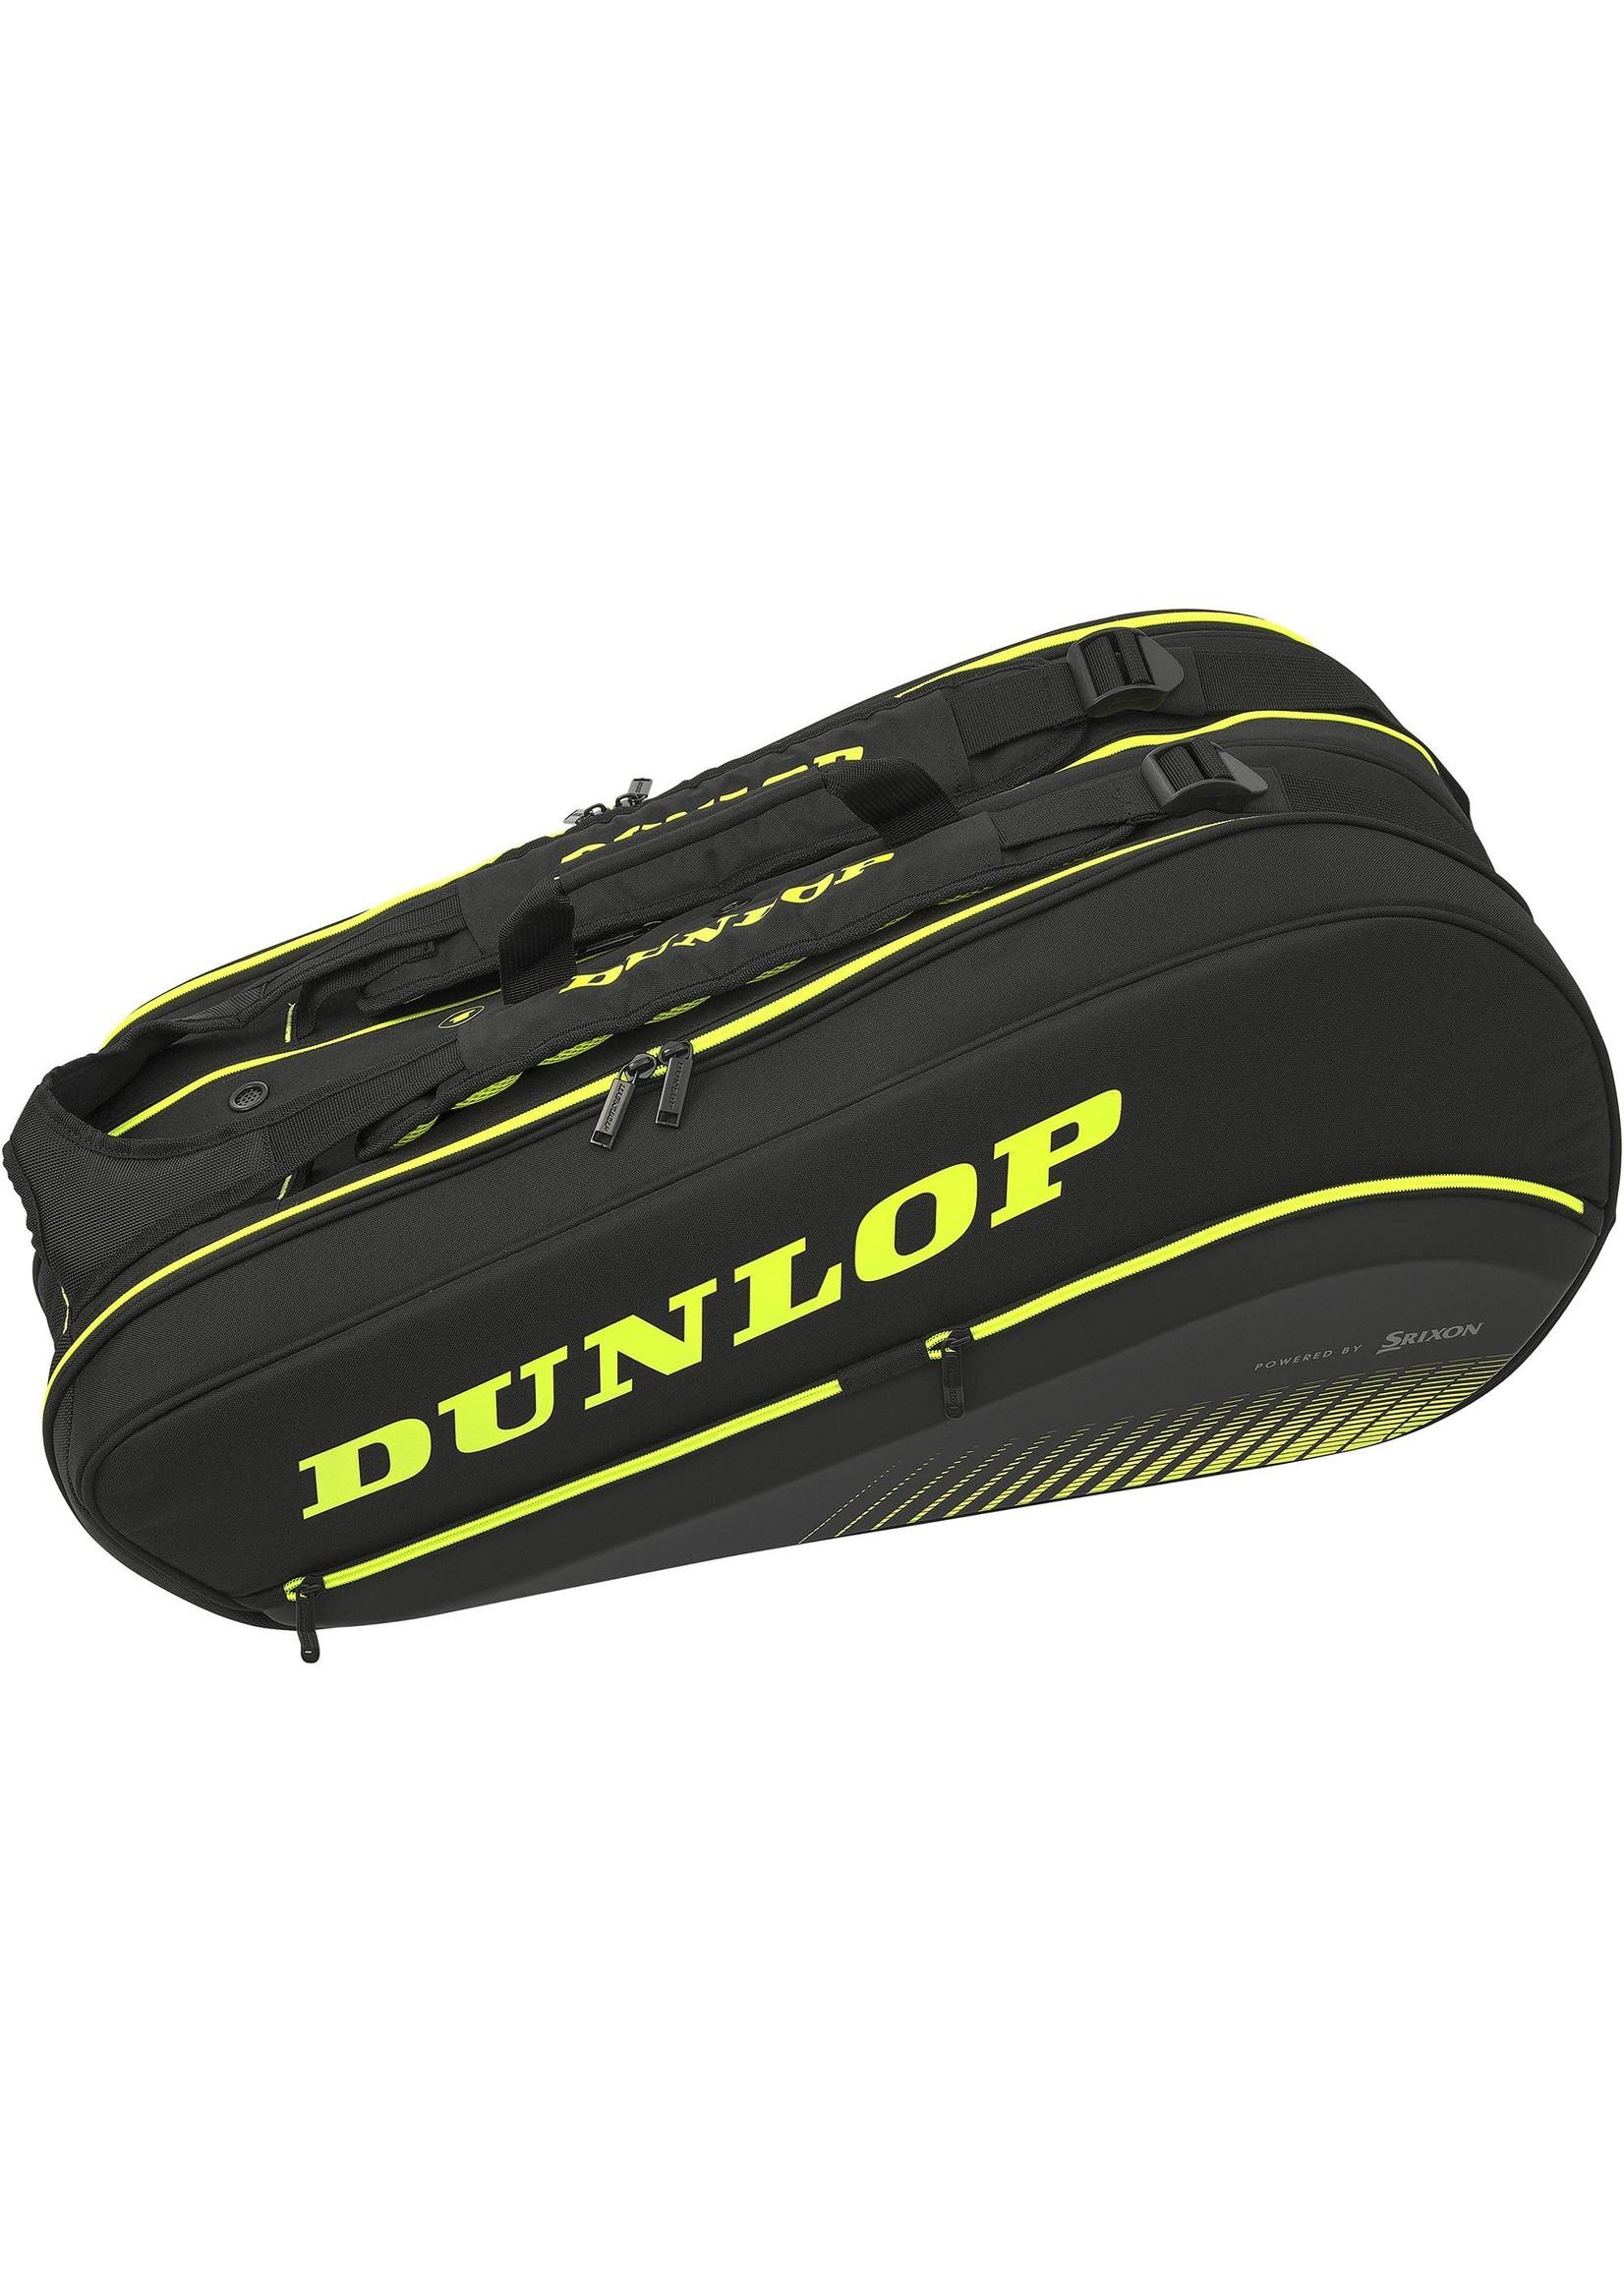 Dunlop Srixon Dunlop SX Performance Thermo 8 Racket Bag (2020)